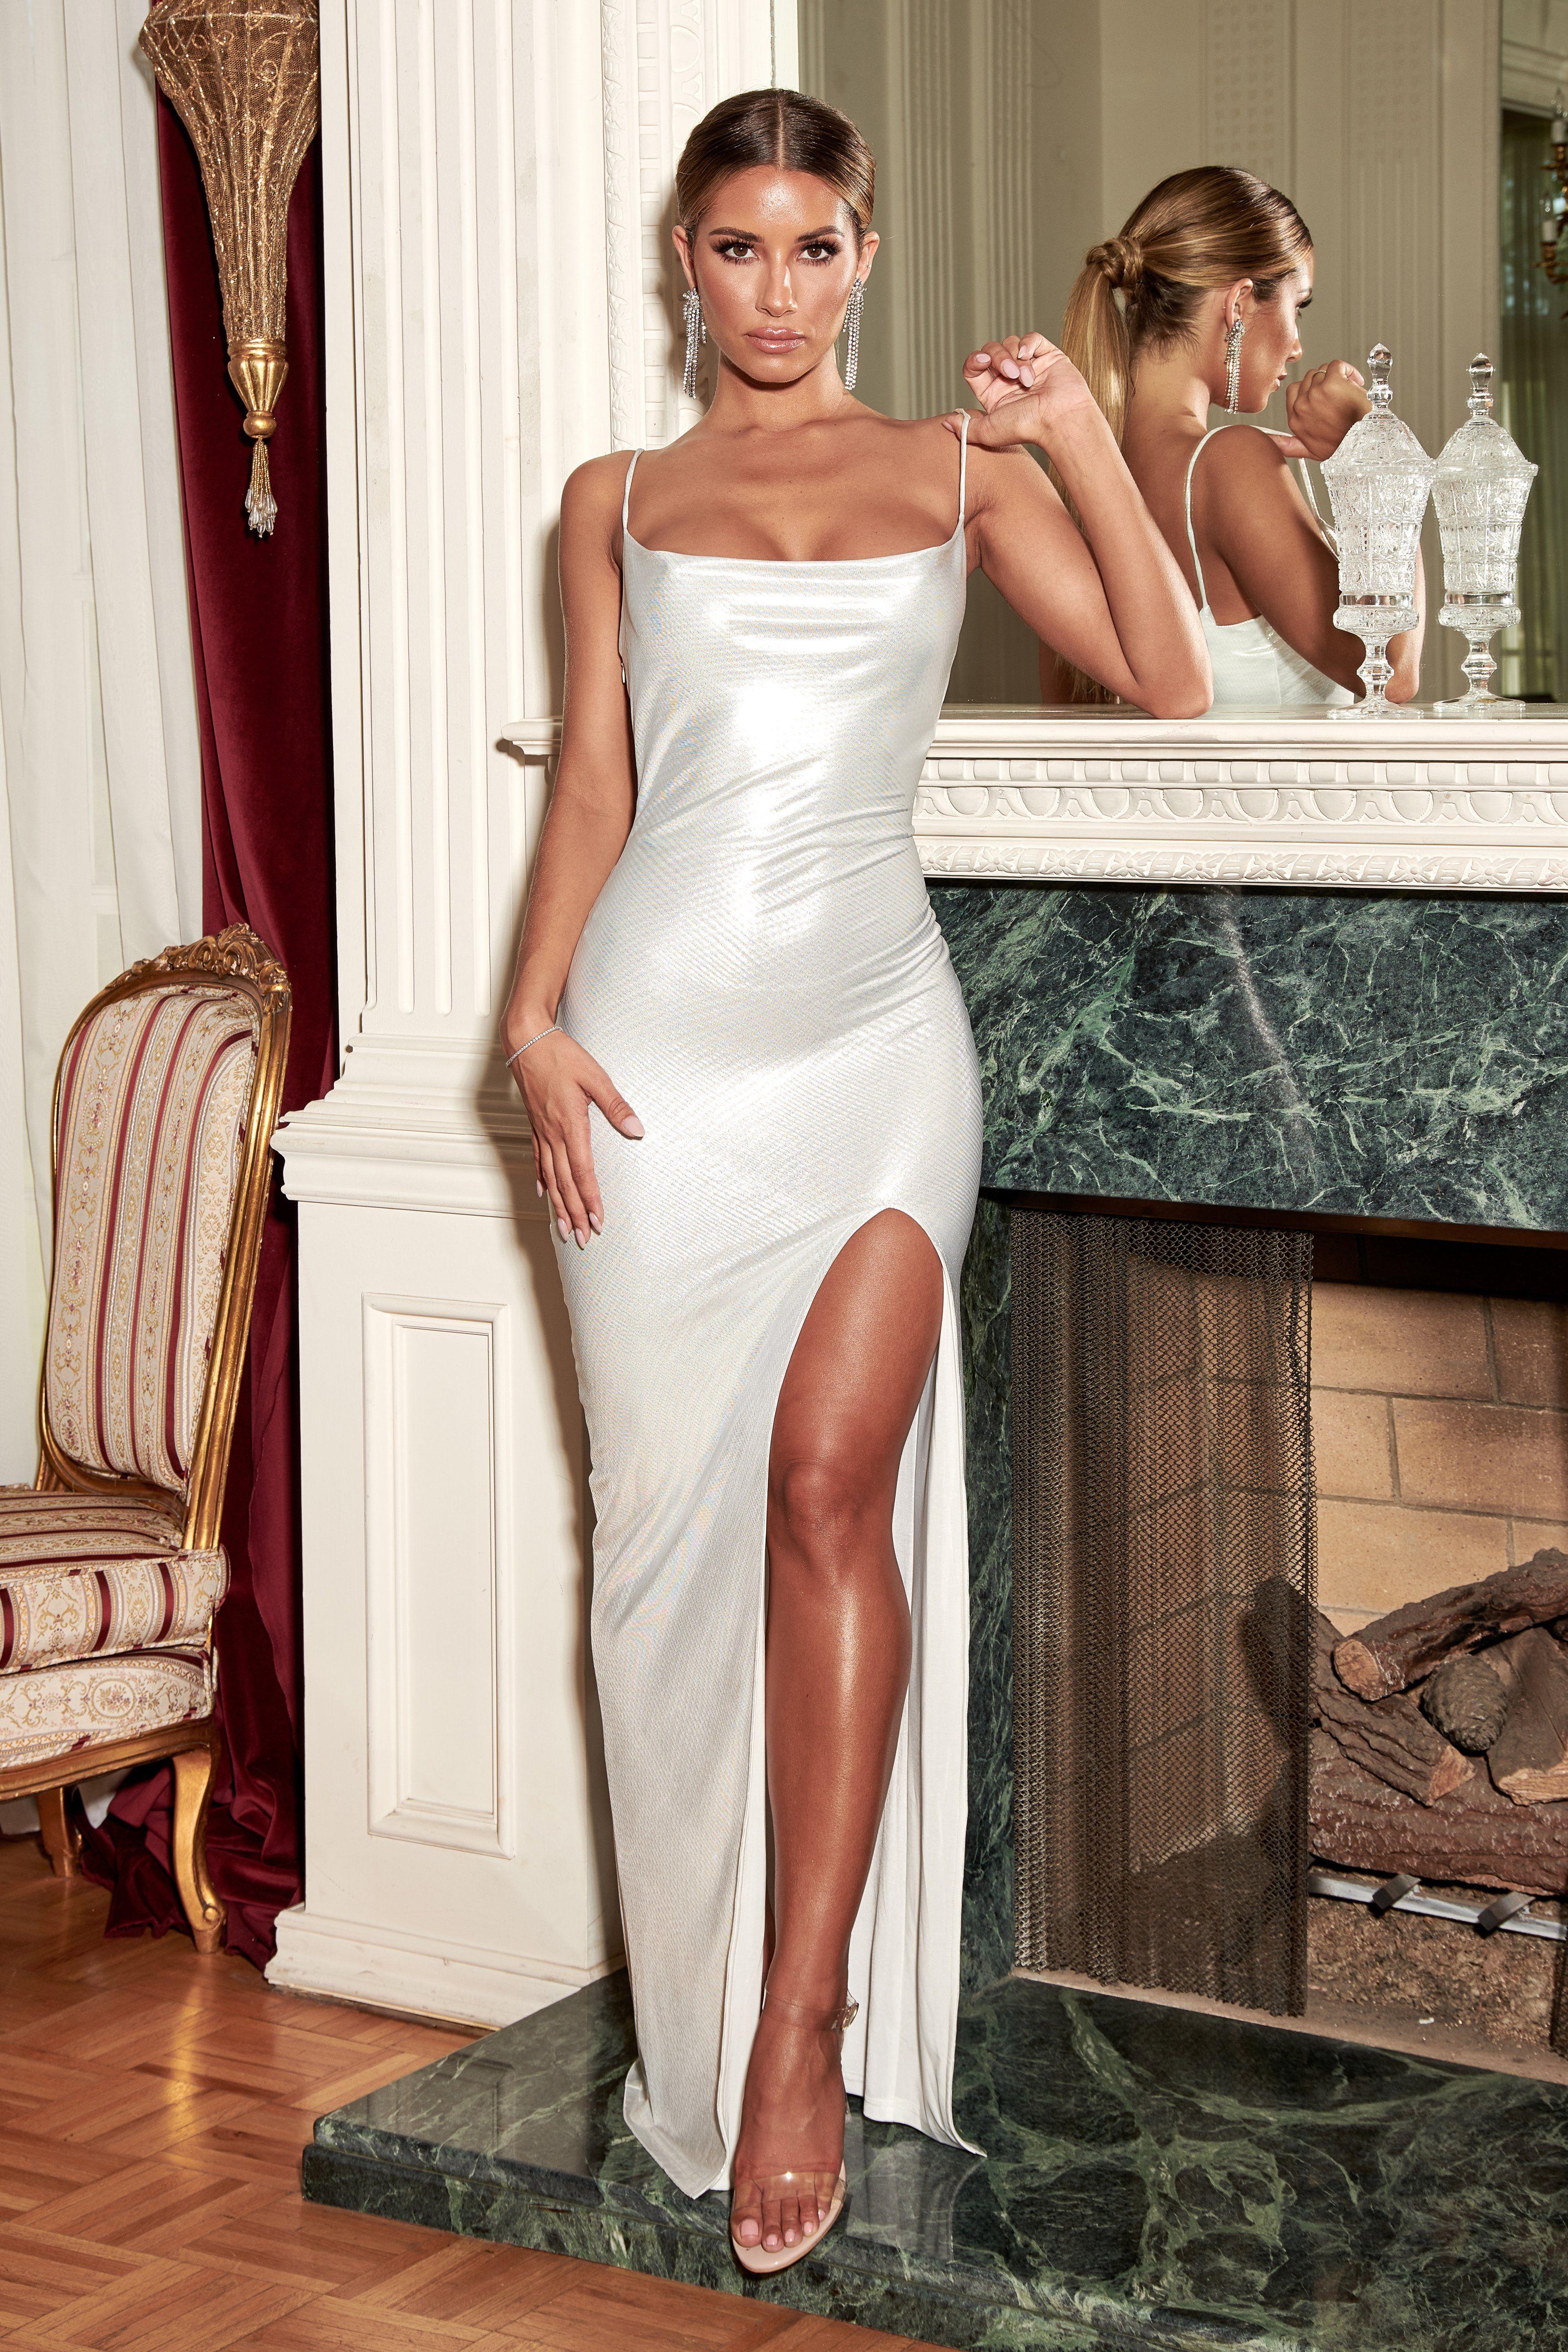 Sparkly Rose Gold Sequin Cowl Back Long Prom Dress - Promfy